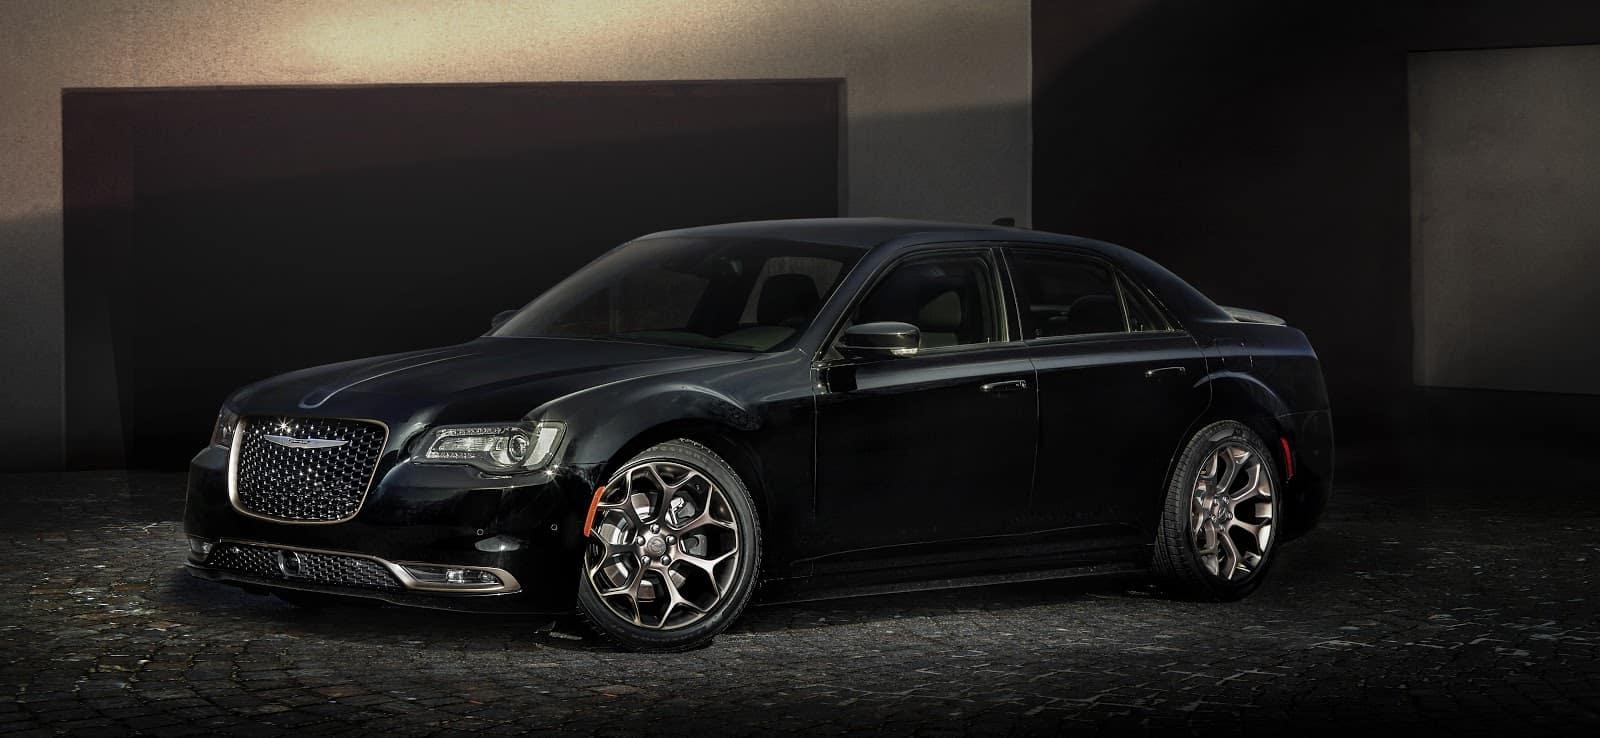 Black Chrysler 300 On Platform